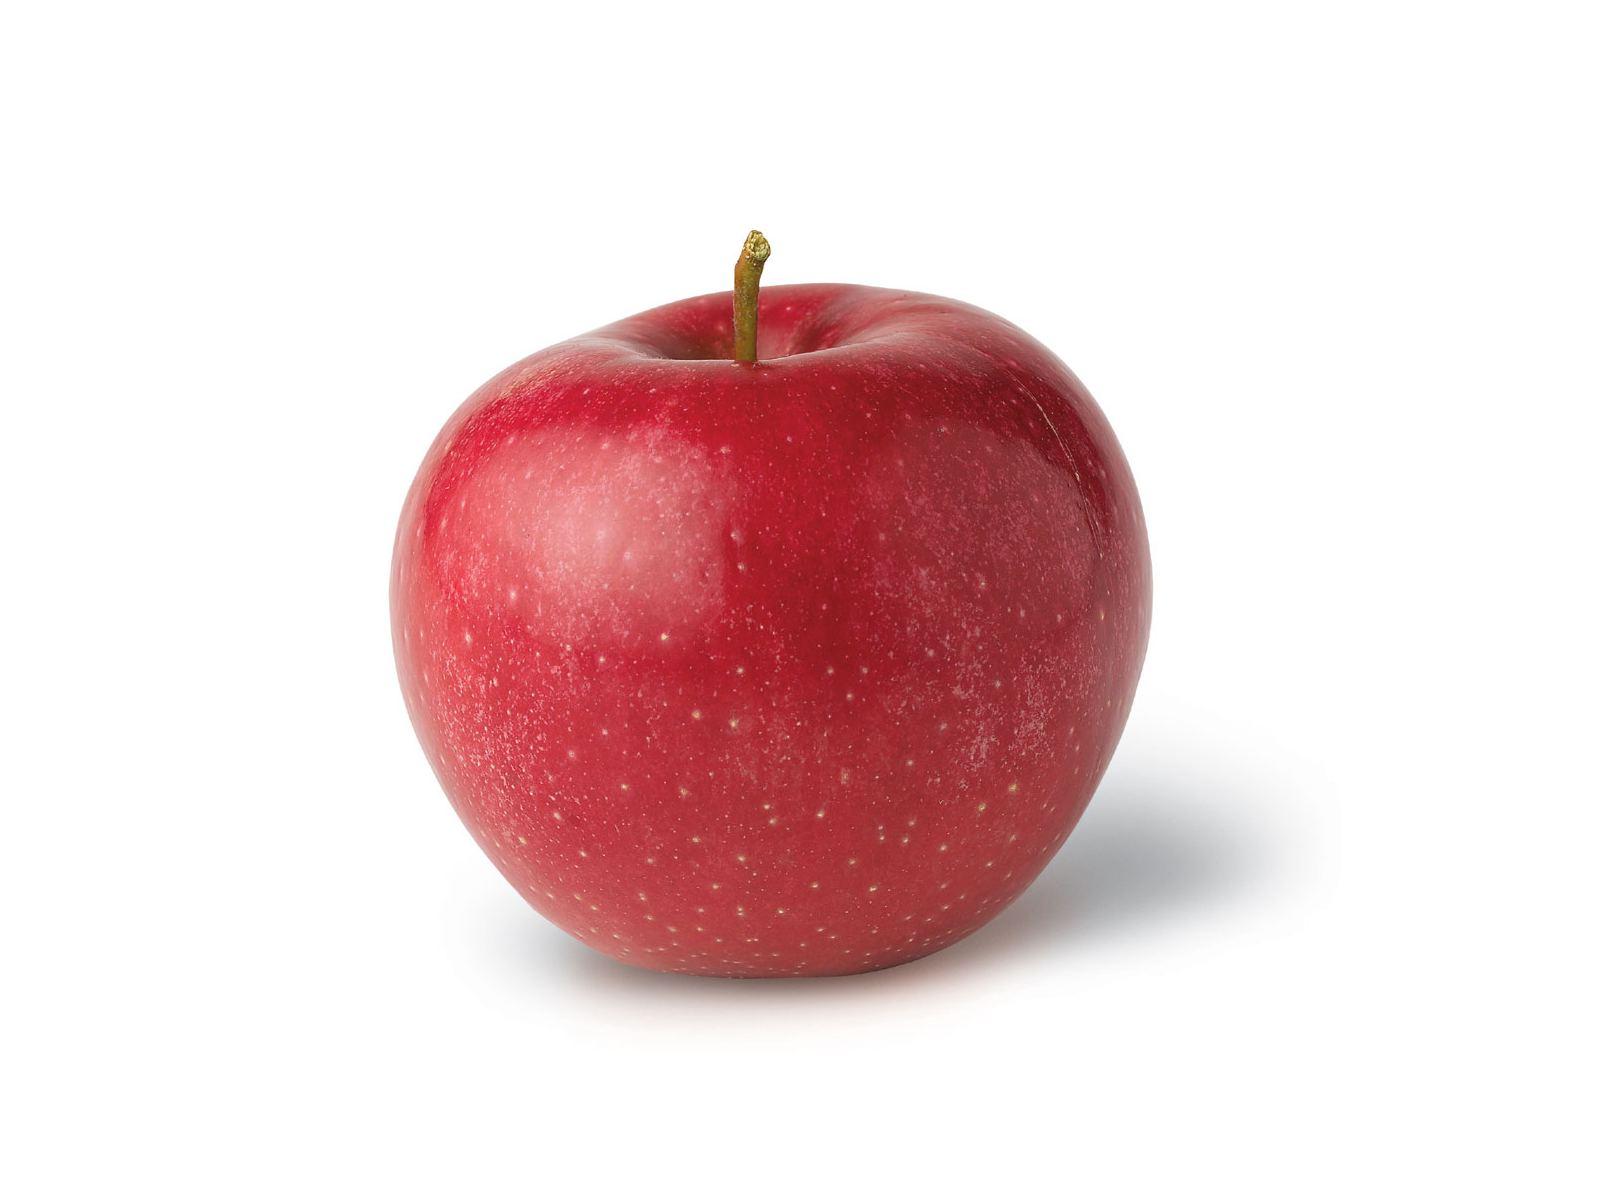 Fresh Apple Wallpaper 1600x1200 24535